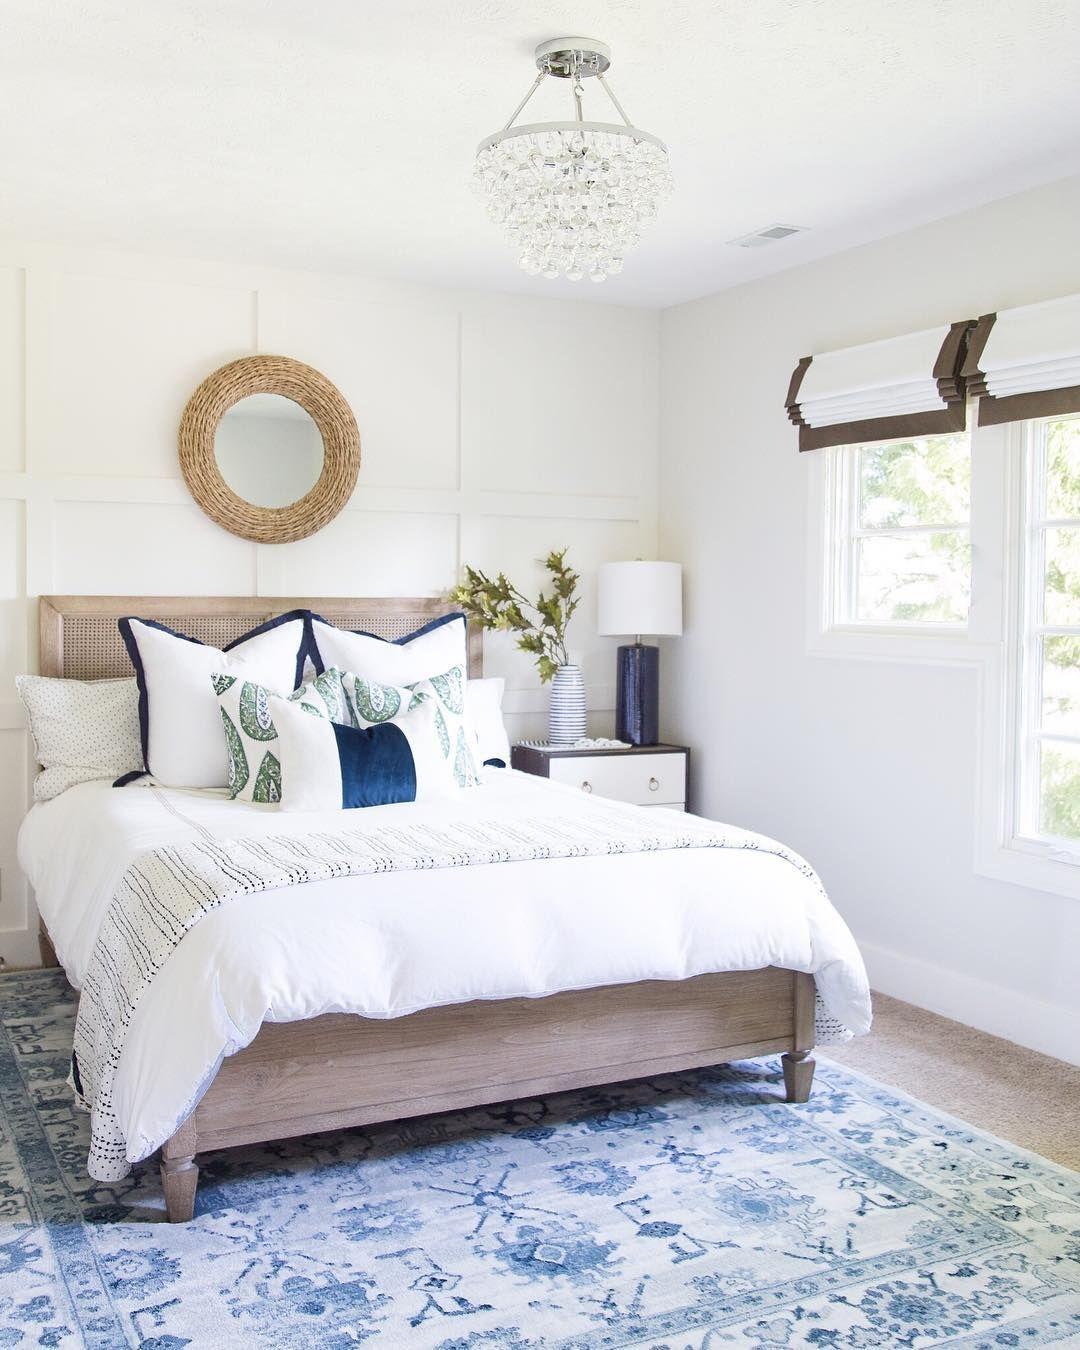 Guest Bedroom Decorating Ideas Guestbedroom 1 Bedroom Guest House Floor Plans Guest Bedroom Design Guest Bedroom Decor Guest Bedroom Update Guest Bedrooms